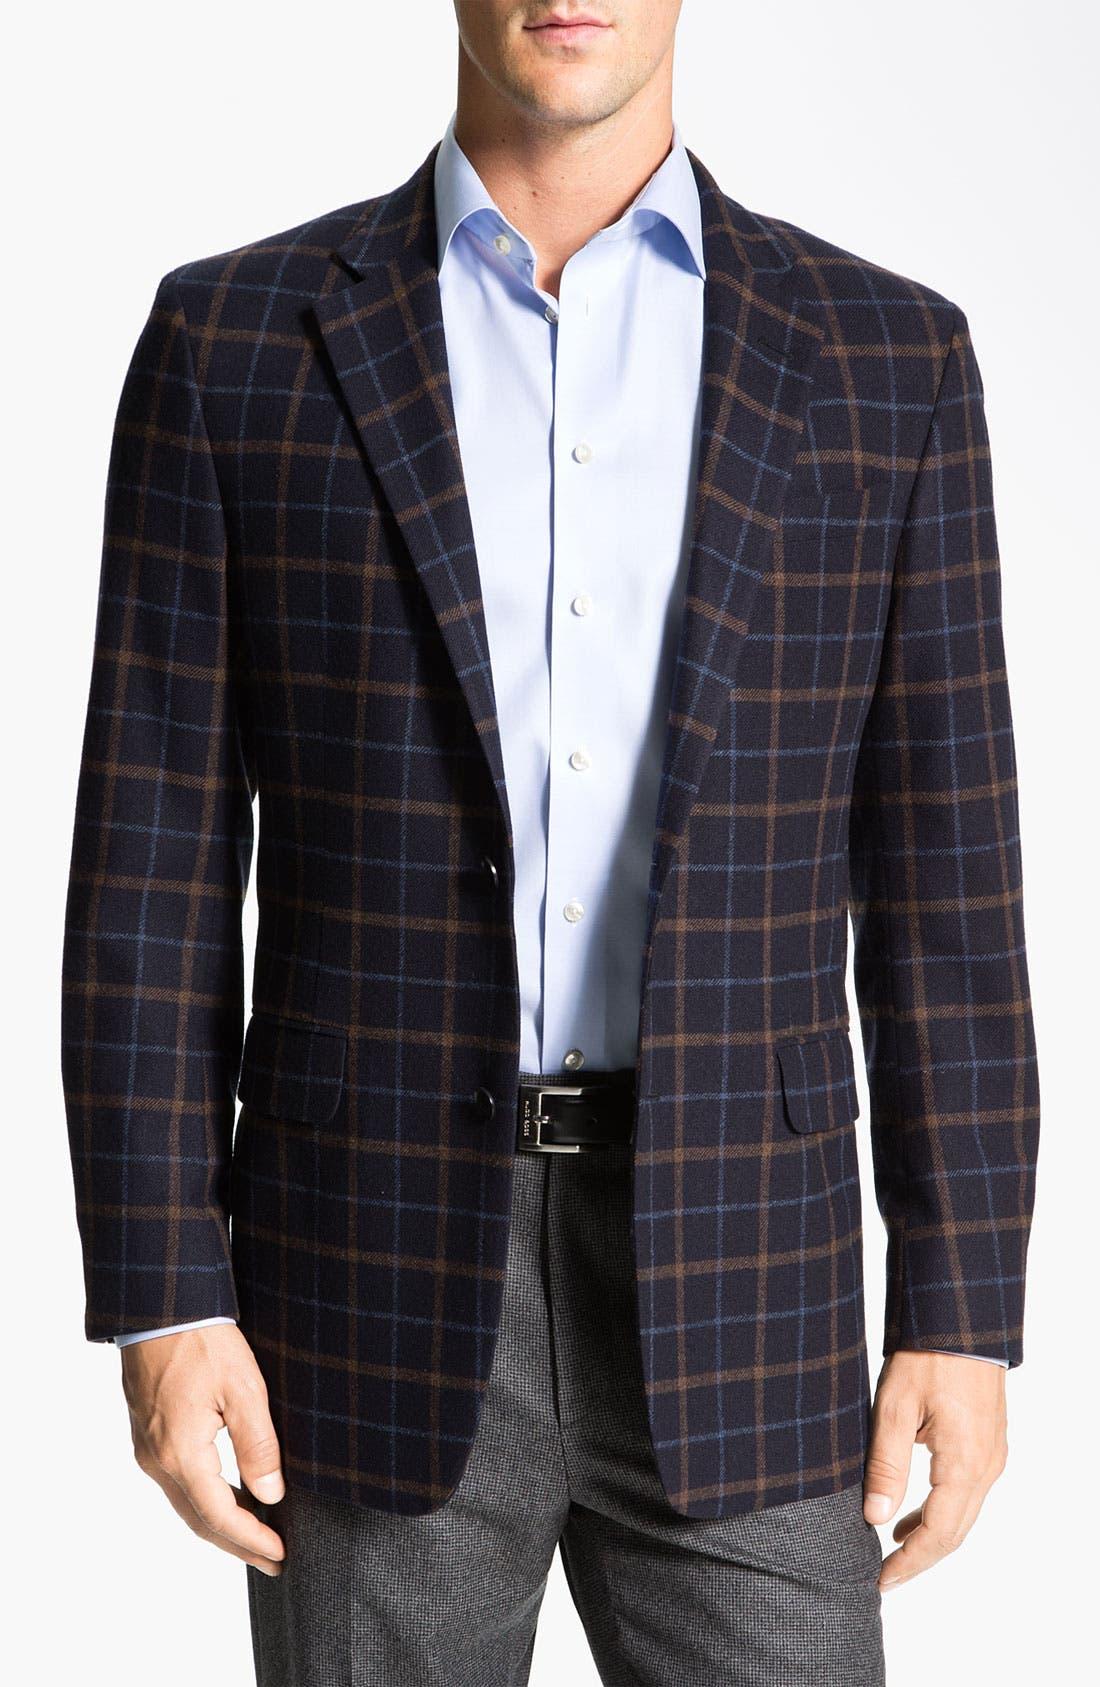 Alternate Image 1 Selected - Robert Talbott Plaid Sportcoat